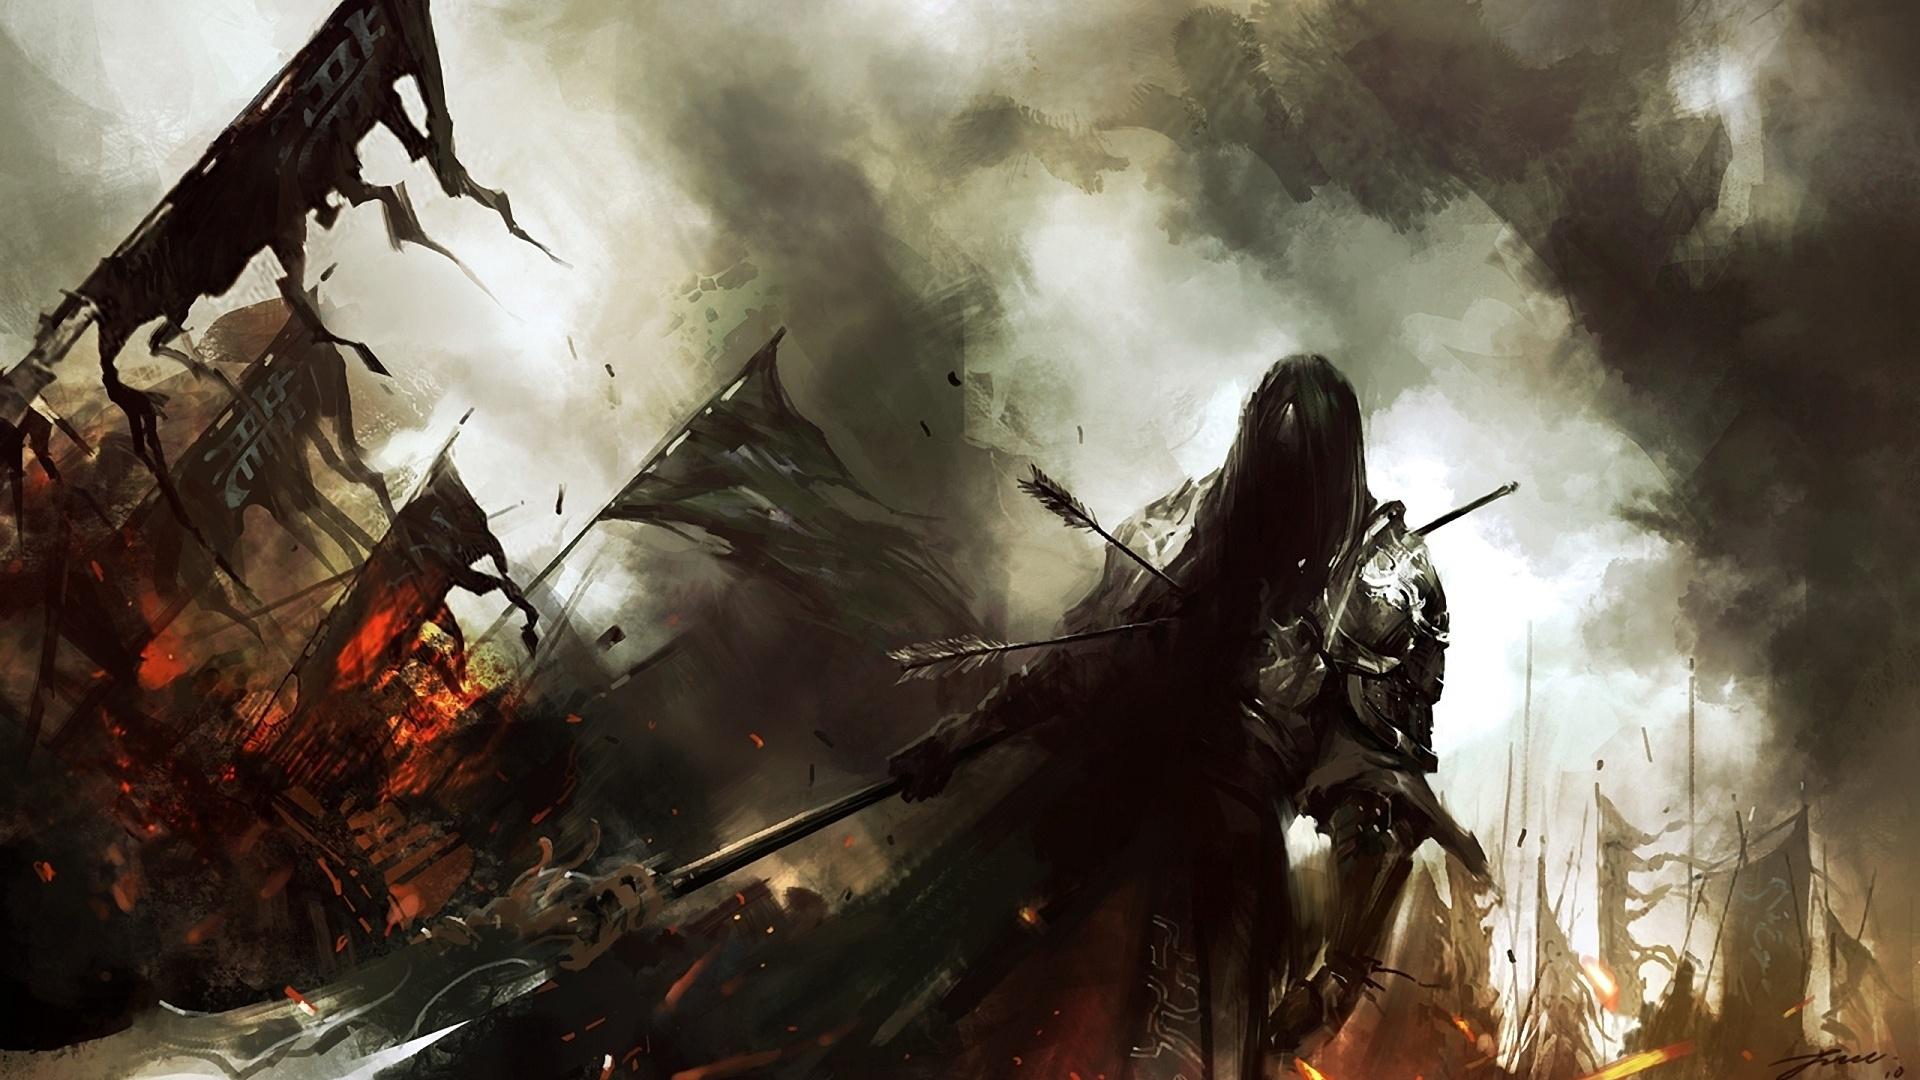 dark warrior knight battle weapons army fire art wallpaper background 1920x1080